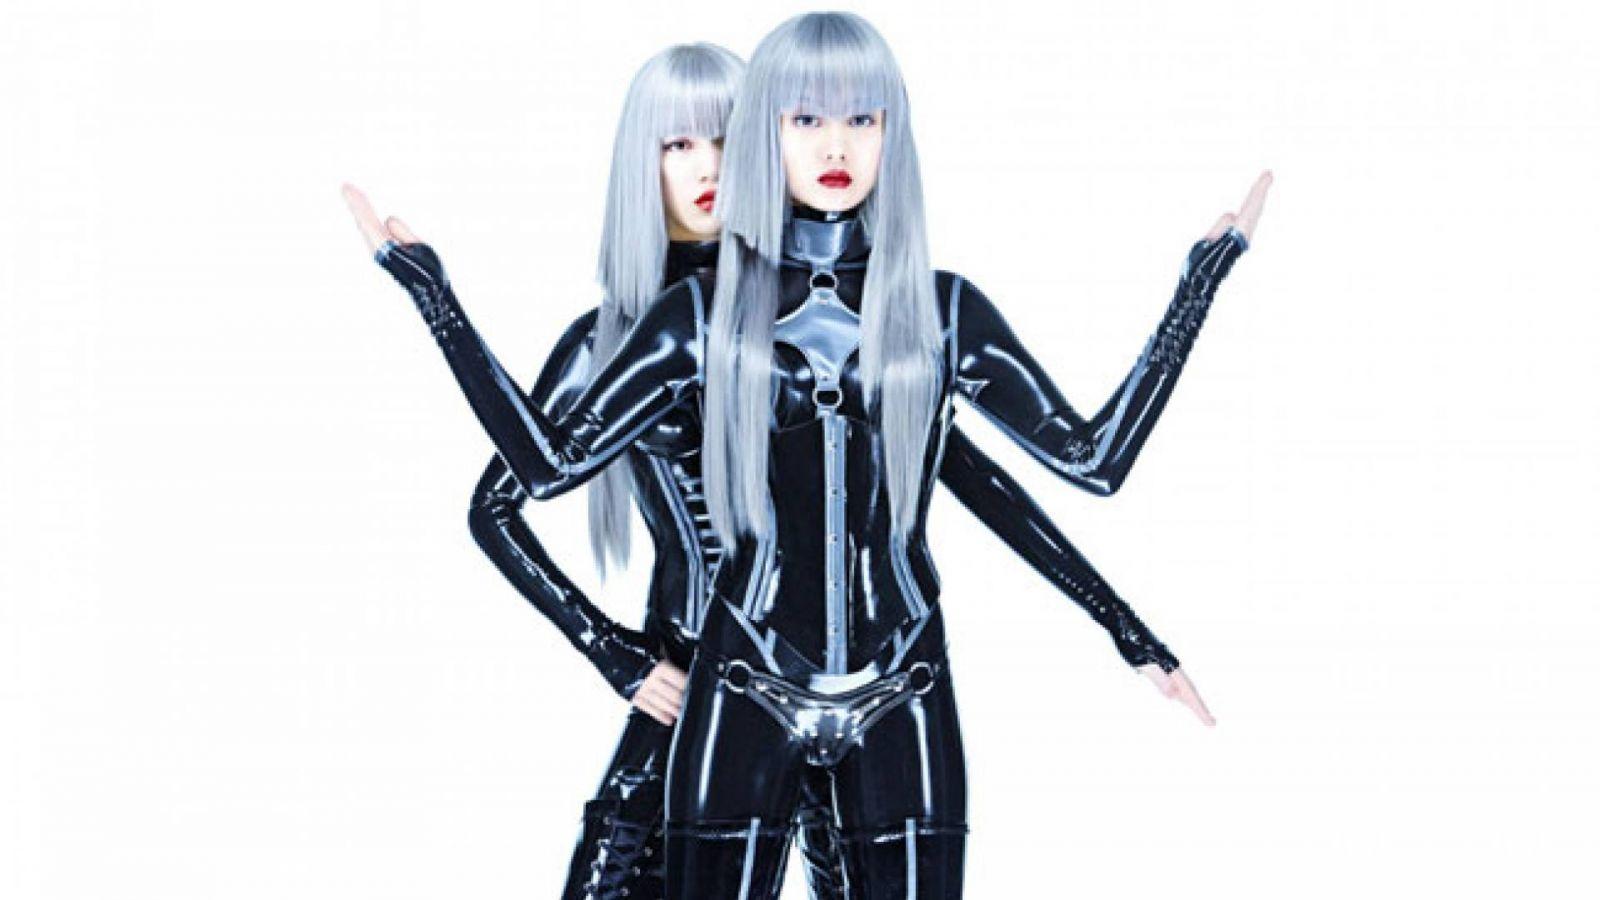 FEMM to Perform at J-Pop Night in West Hollywood © FEMM